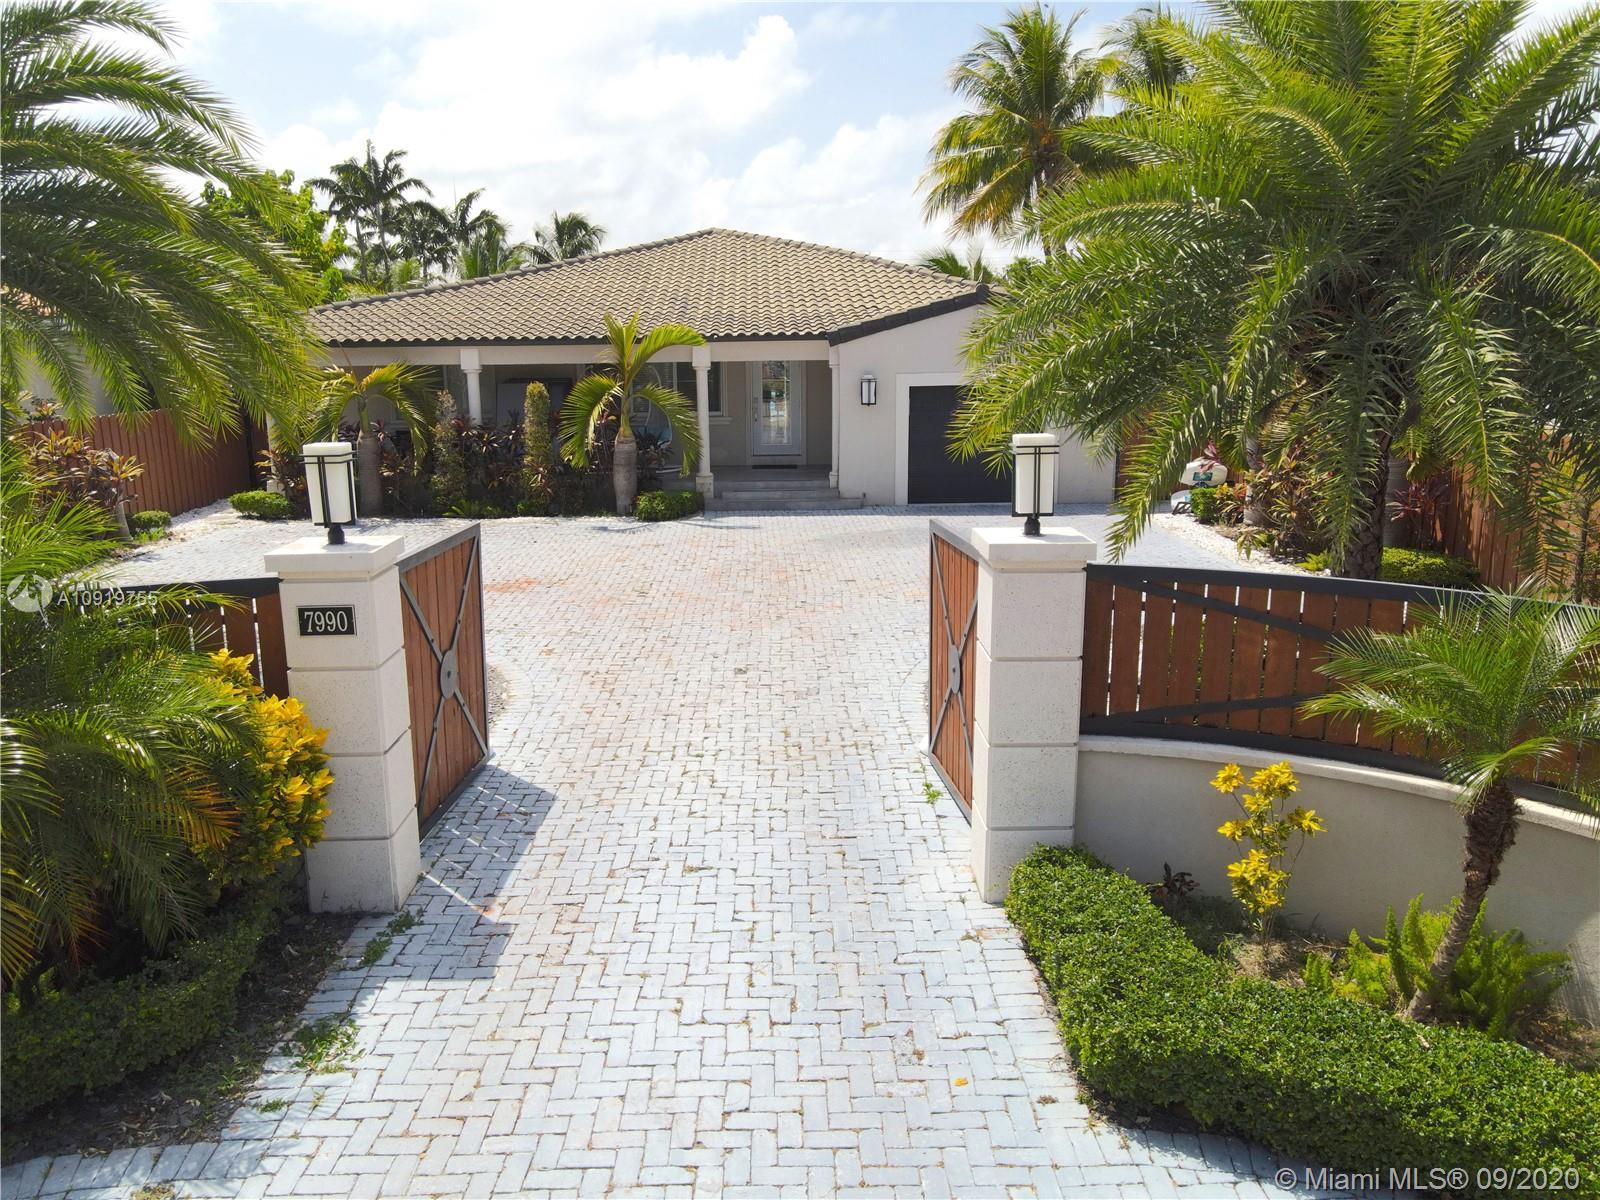 Biscayne Point - 7990 Hawthorne Ave, Miami Beach, FL 33141